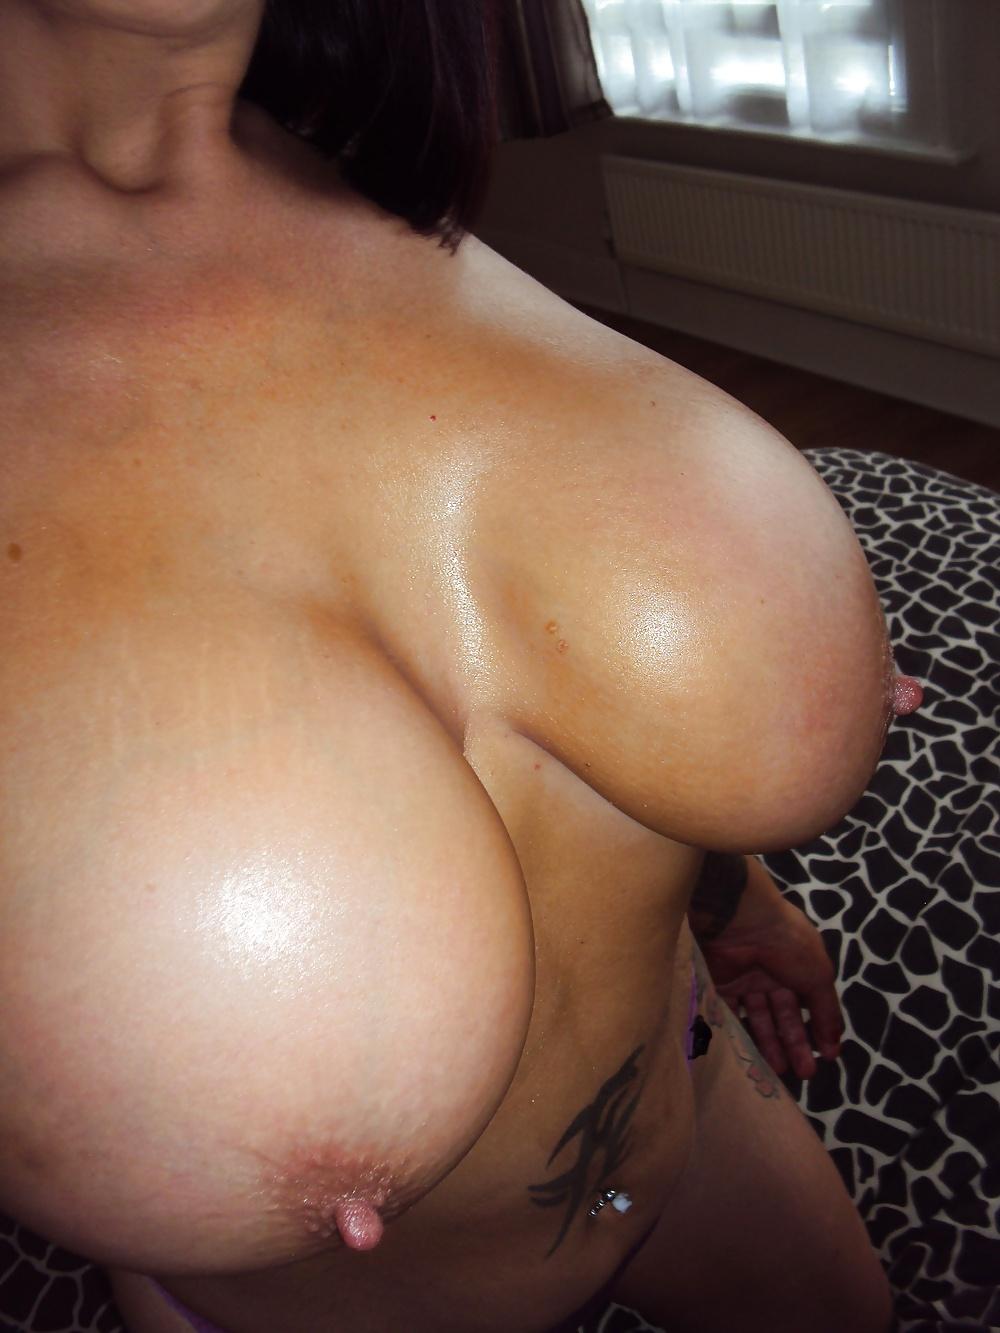 Tantalizing tits